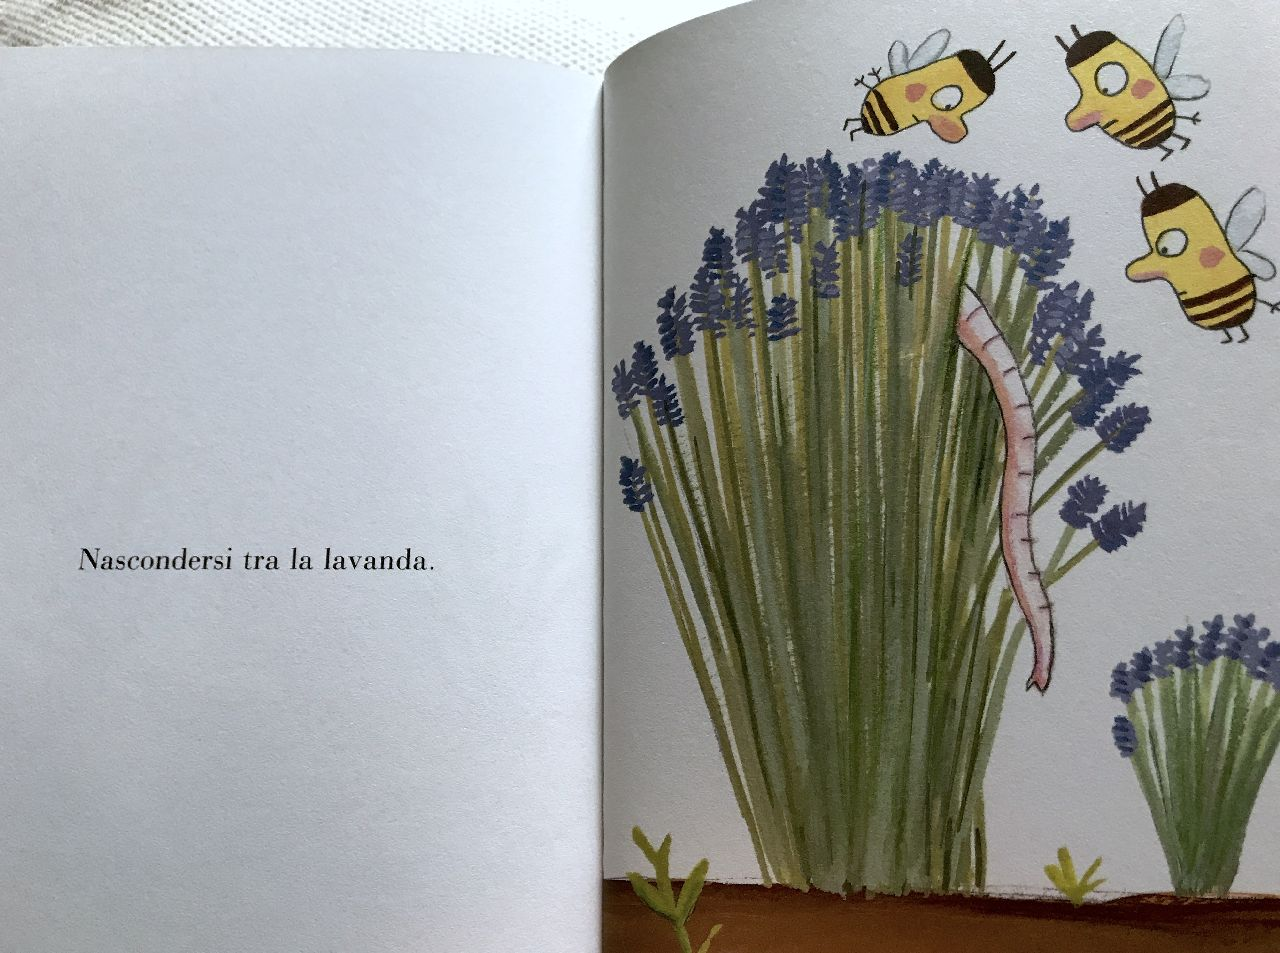 Ramona Badescu - Benjamin Chaud, Pomelo. Elefantino da giardino, Terredimezzo